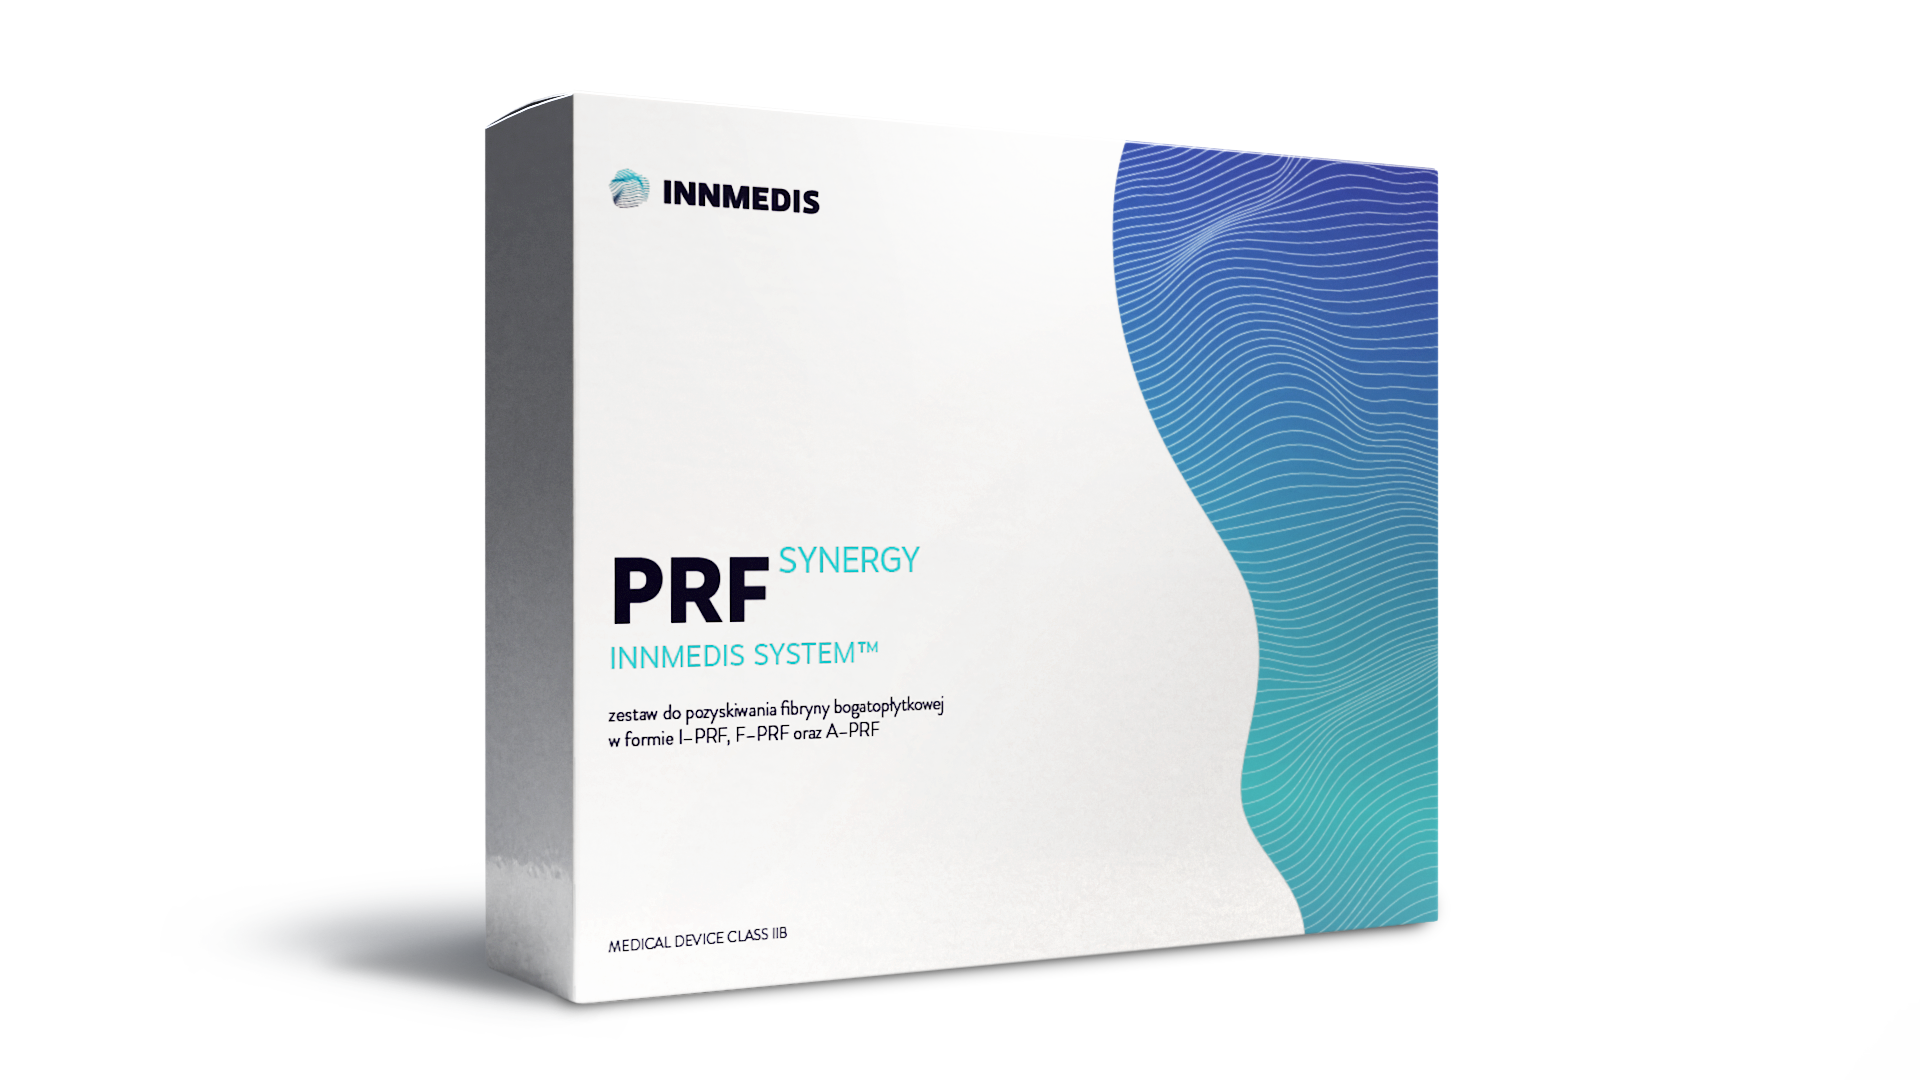 PRF Synergy Innmedis System™